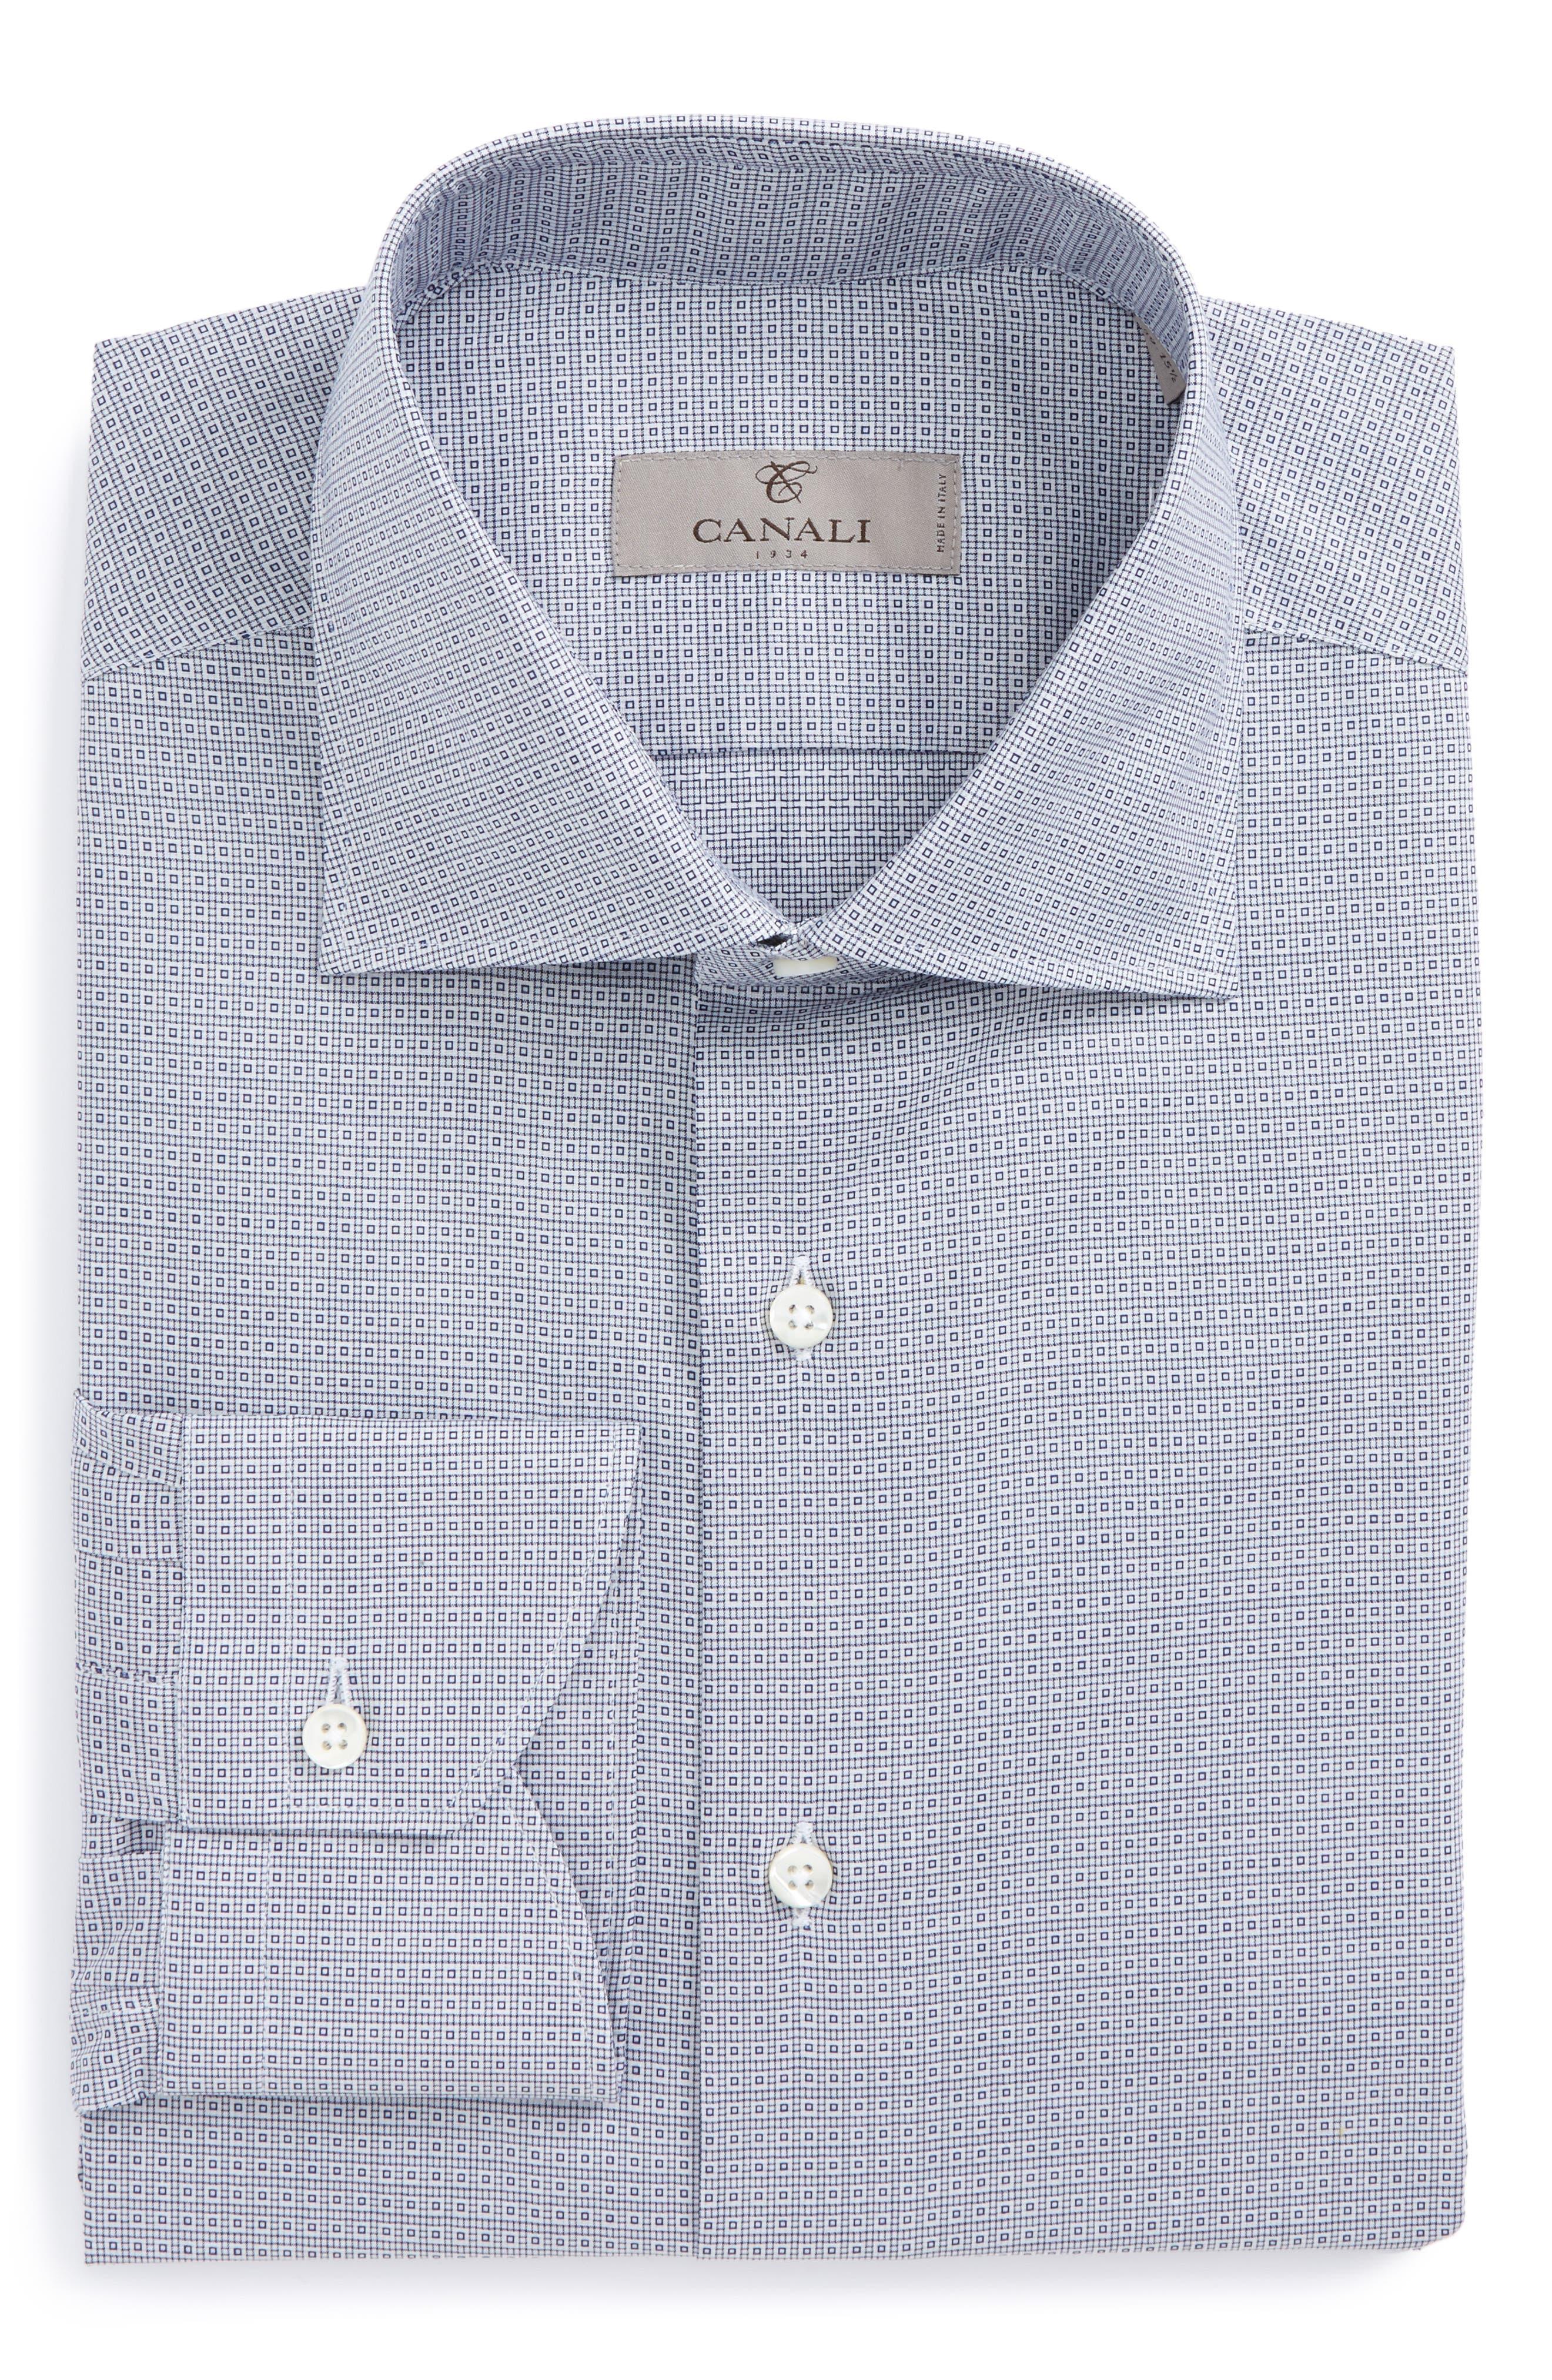 Regular Fit Geometric Dress Shirt,                         Main,                         color, Blue